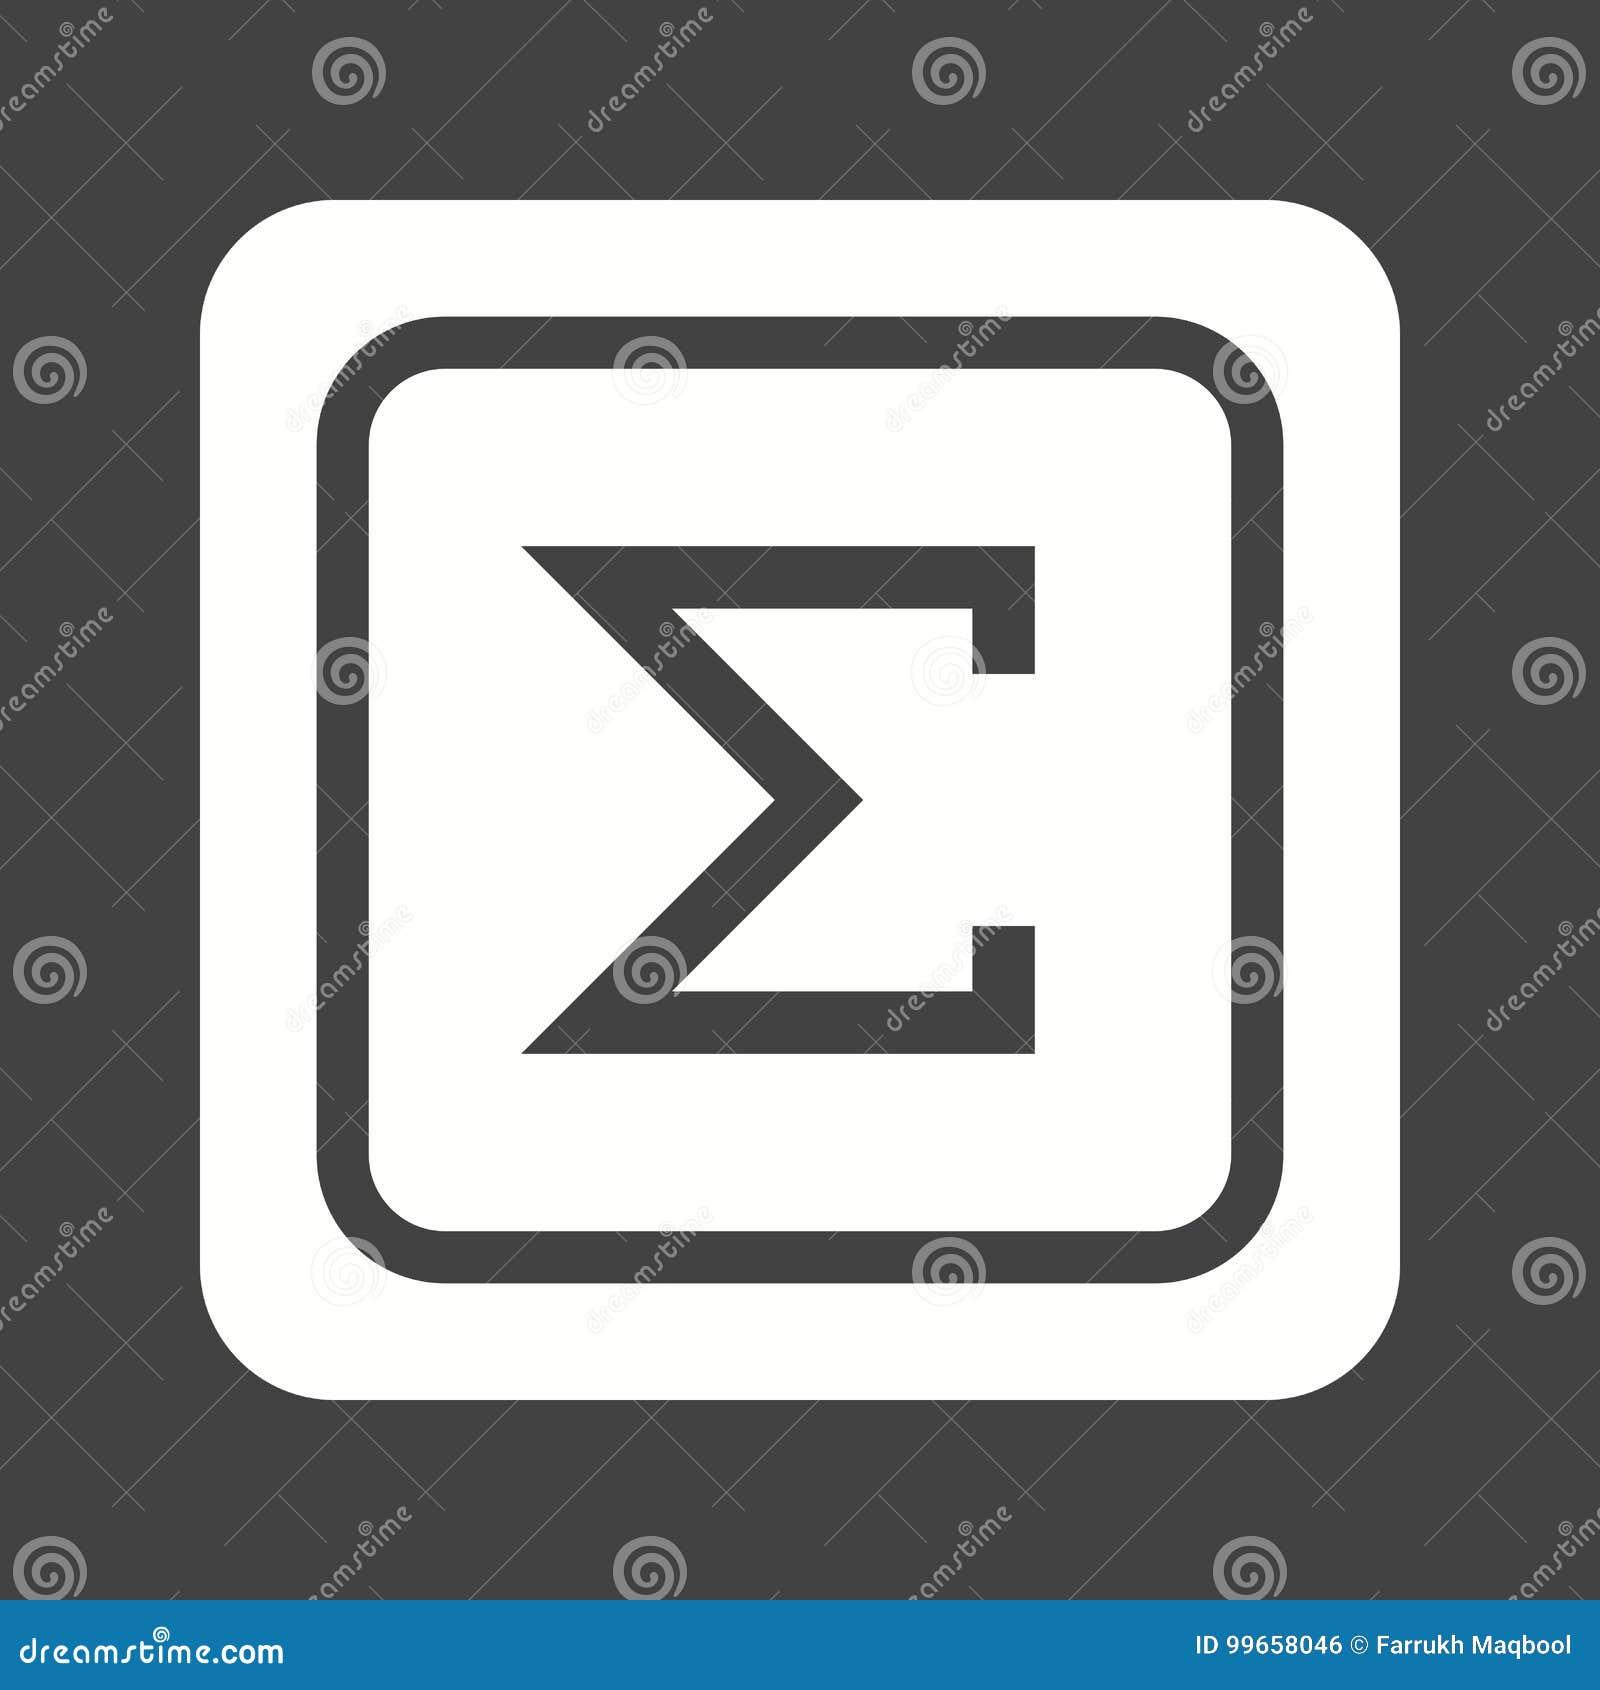 Summation Symbol Stock Vector Illustration Of Math Statistics